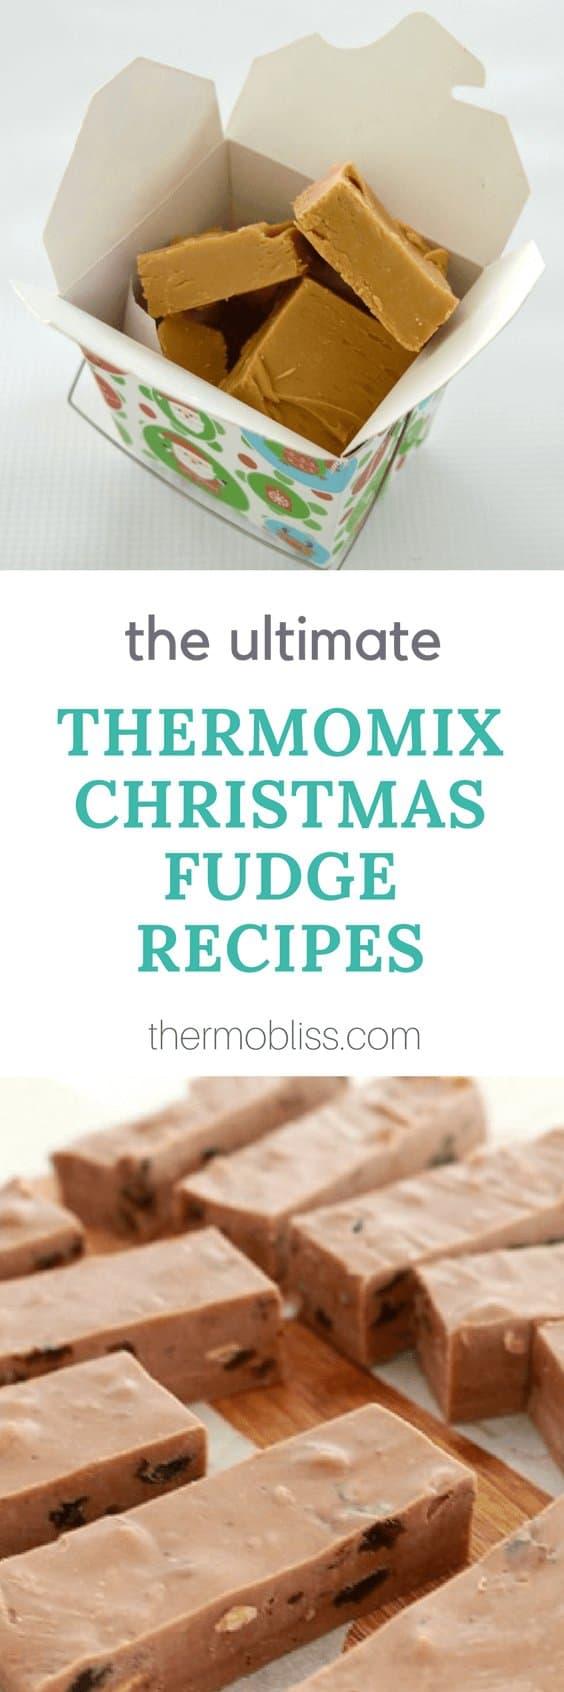 Thermomix Christmas Fudge Recipes